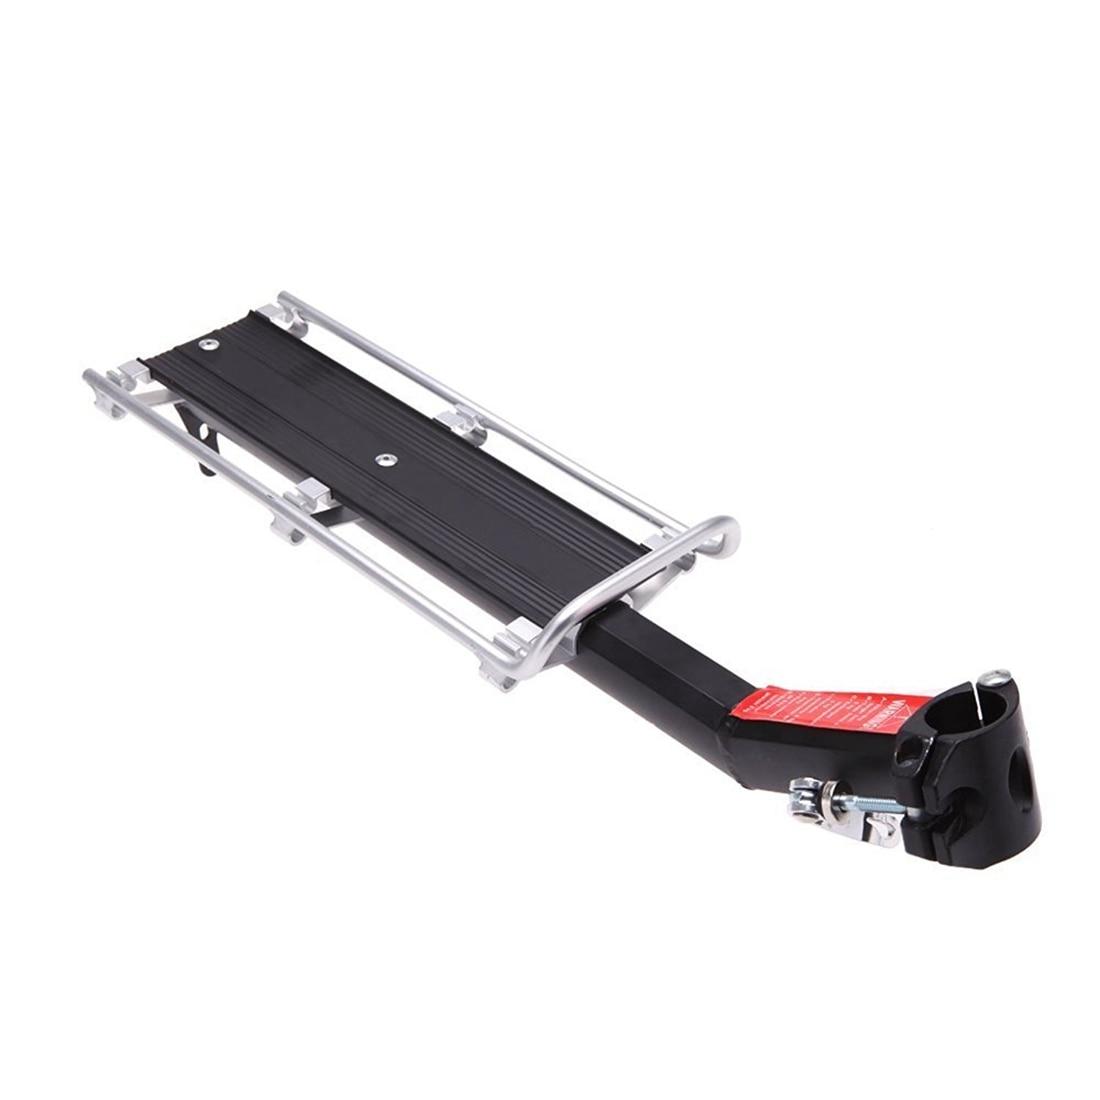 Good deal MTB Bicycle Carrier Rack Seat Post Rear Shelf Aluminum Alloy Outdoor TE Q8G2